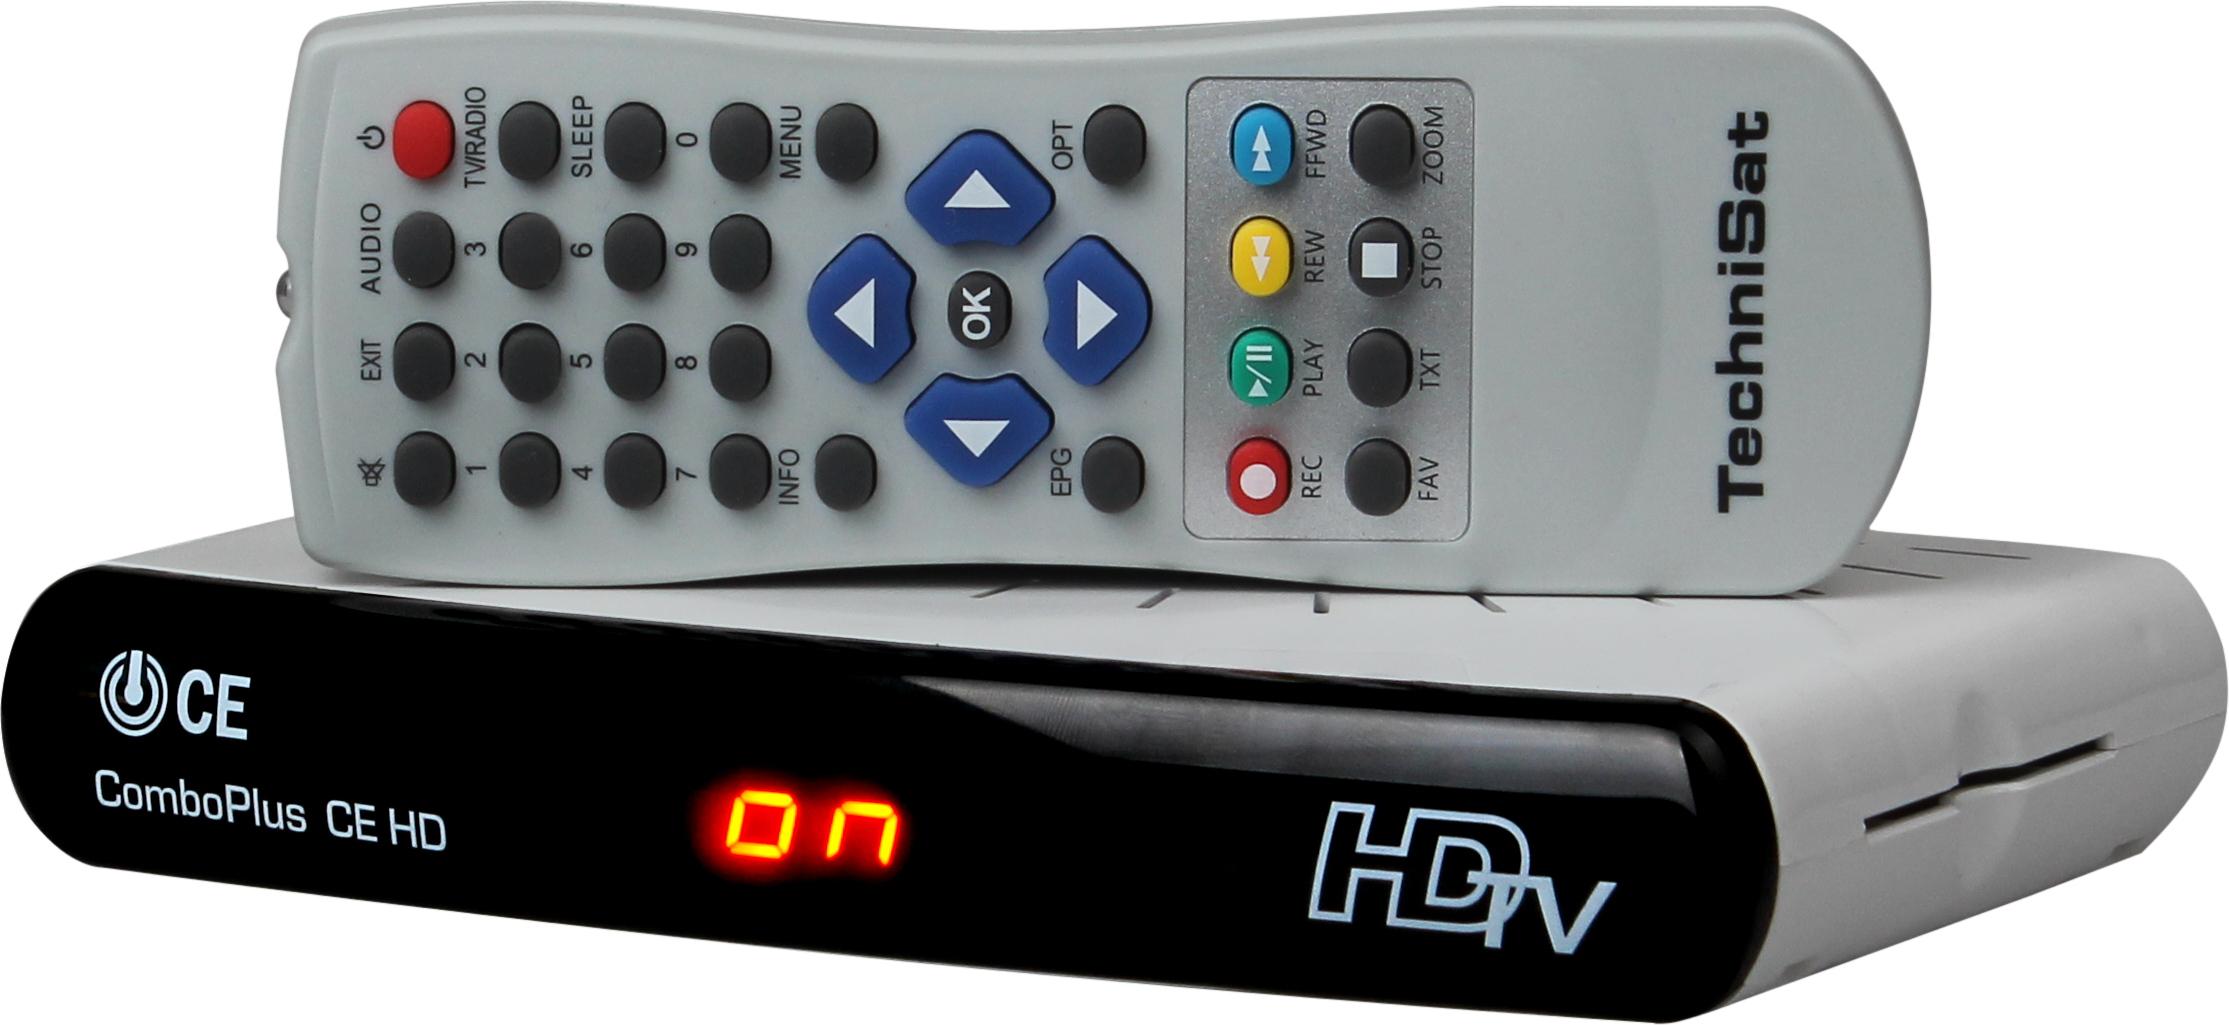 TUNER TECHNISAT COMBOBOX PLUS DVB-T SMART HD+ HDMI, USB